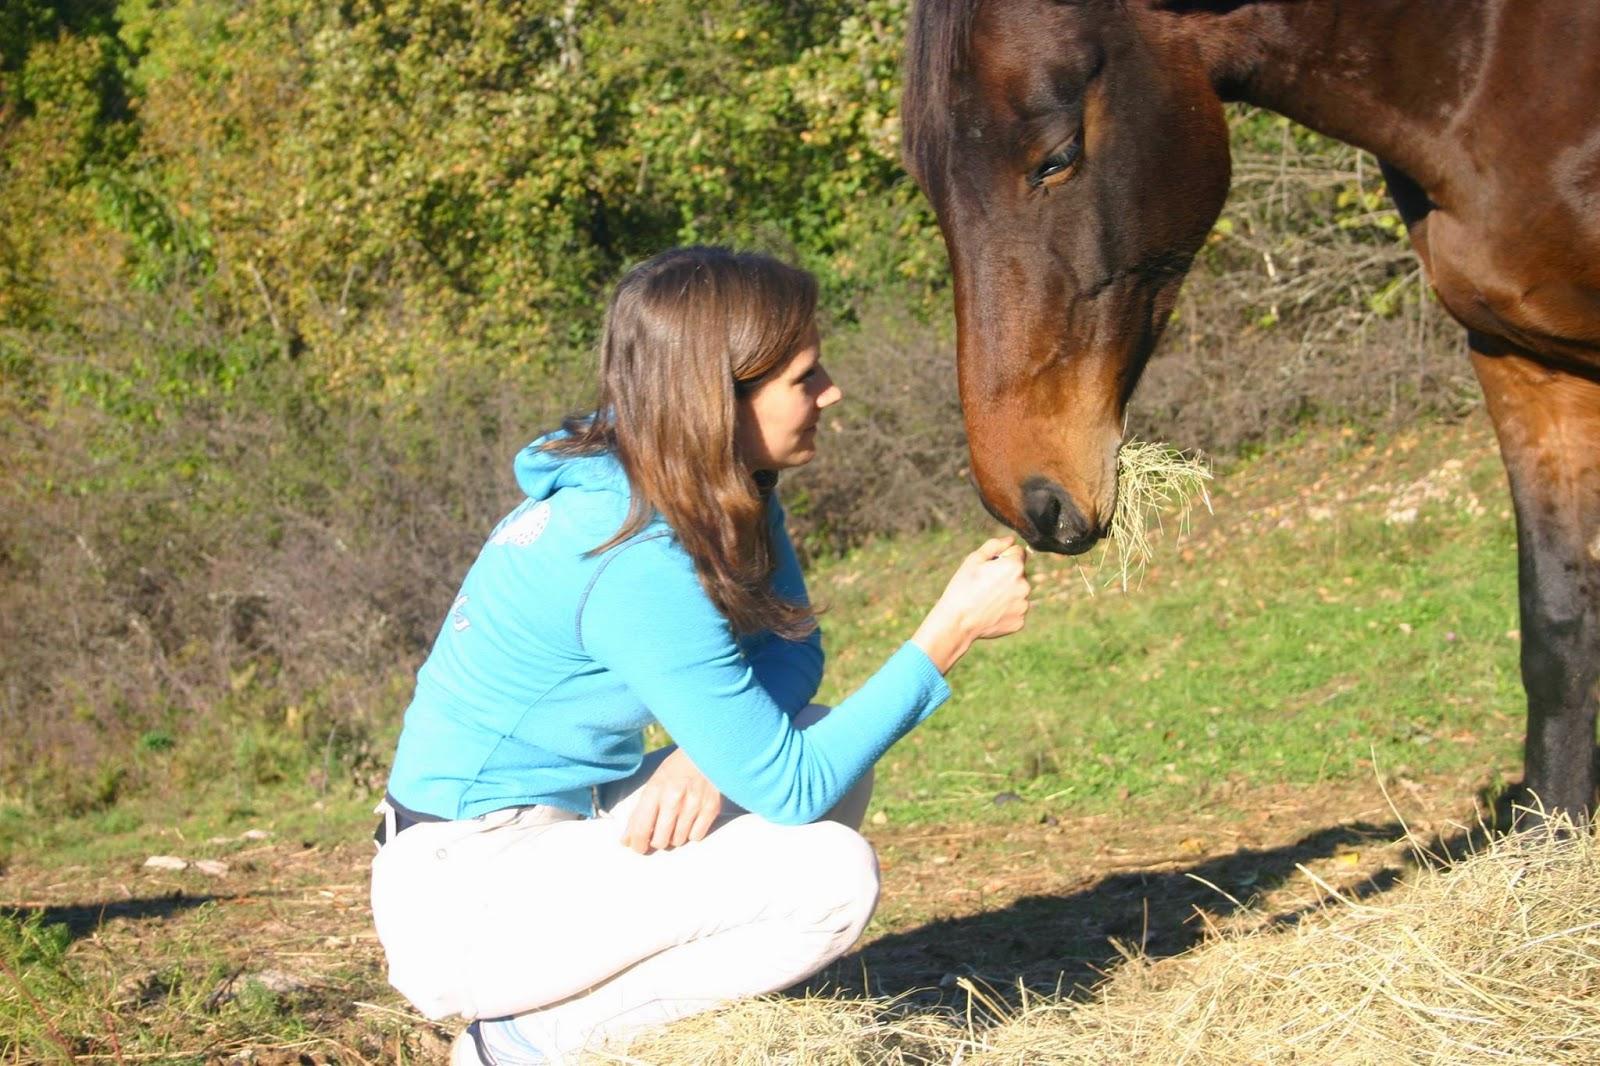 besitzer tötet pferd